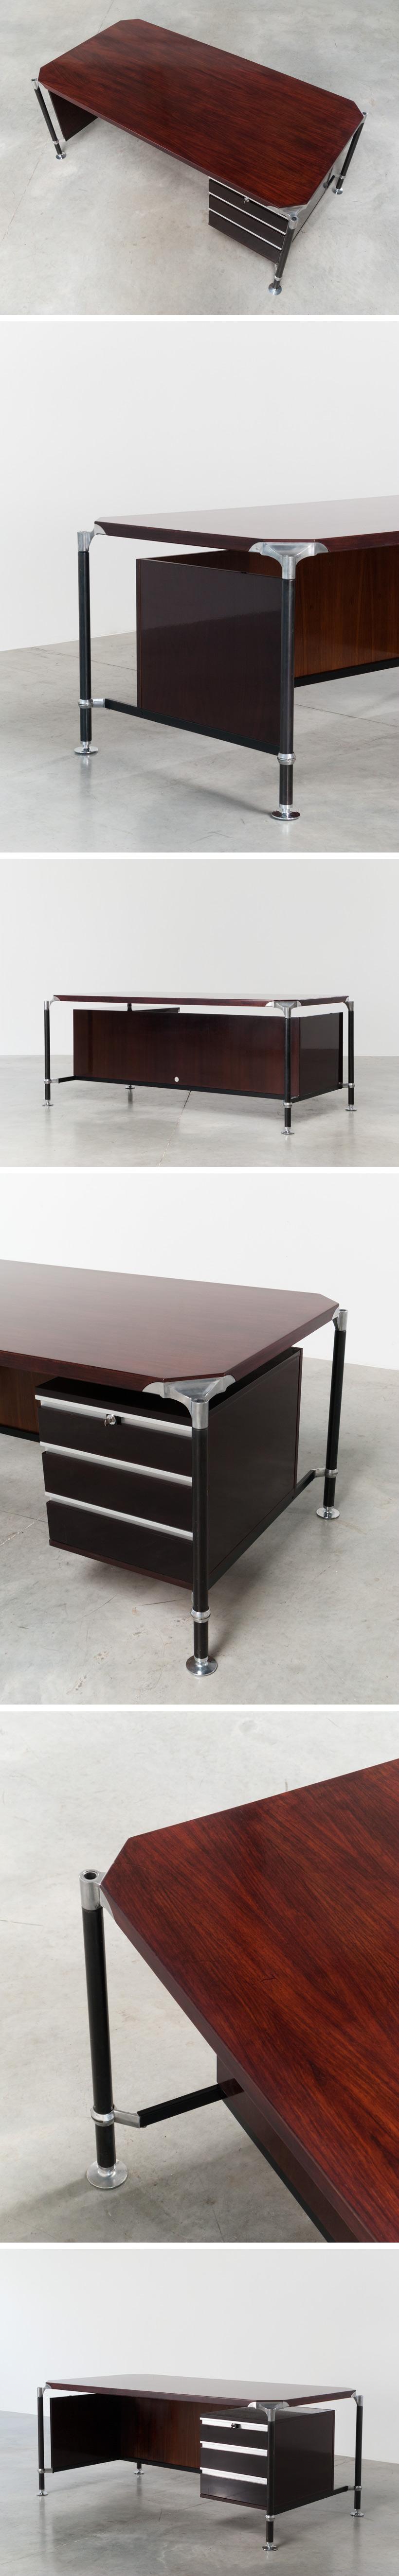 Luisa and Ico Parisi rosewood executive desk for MIM Large